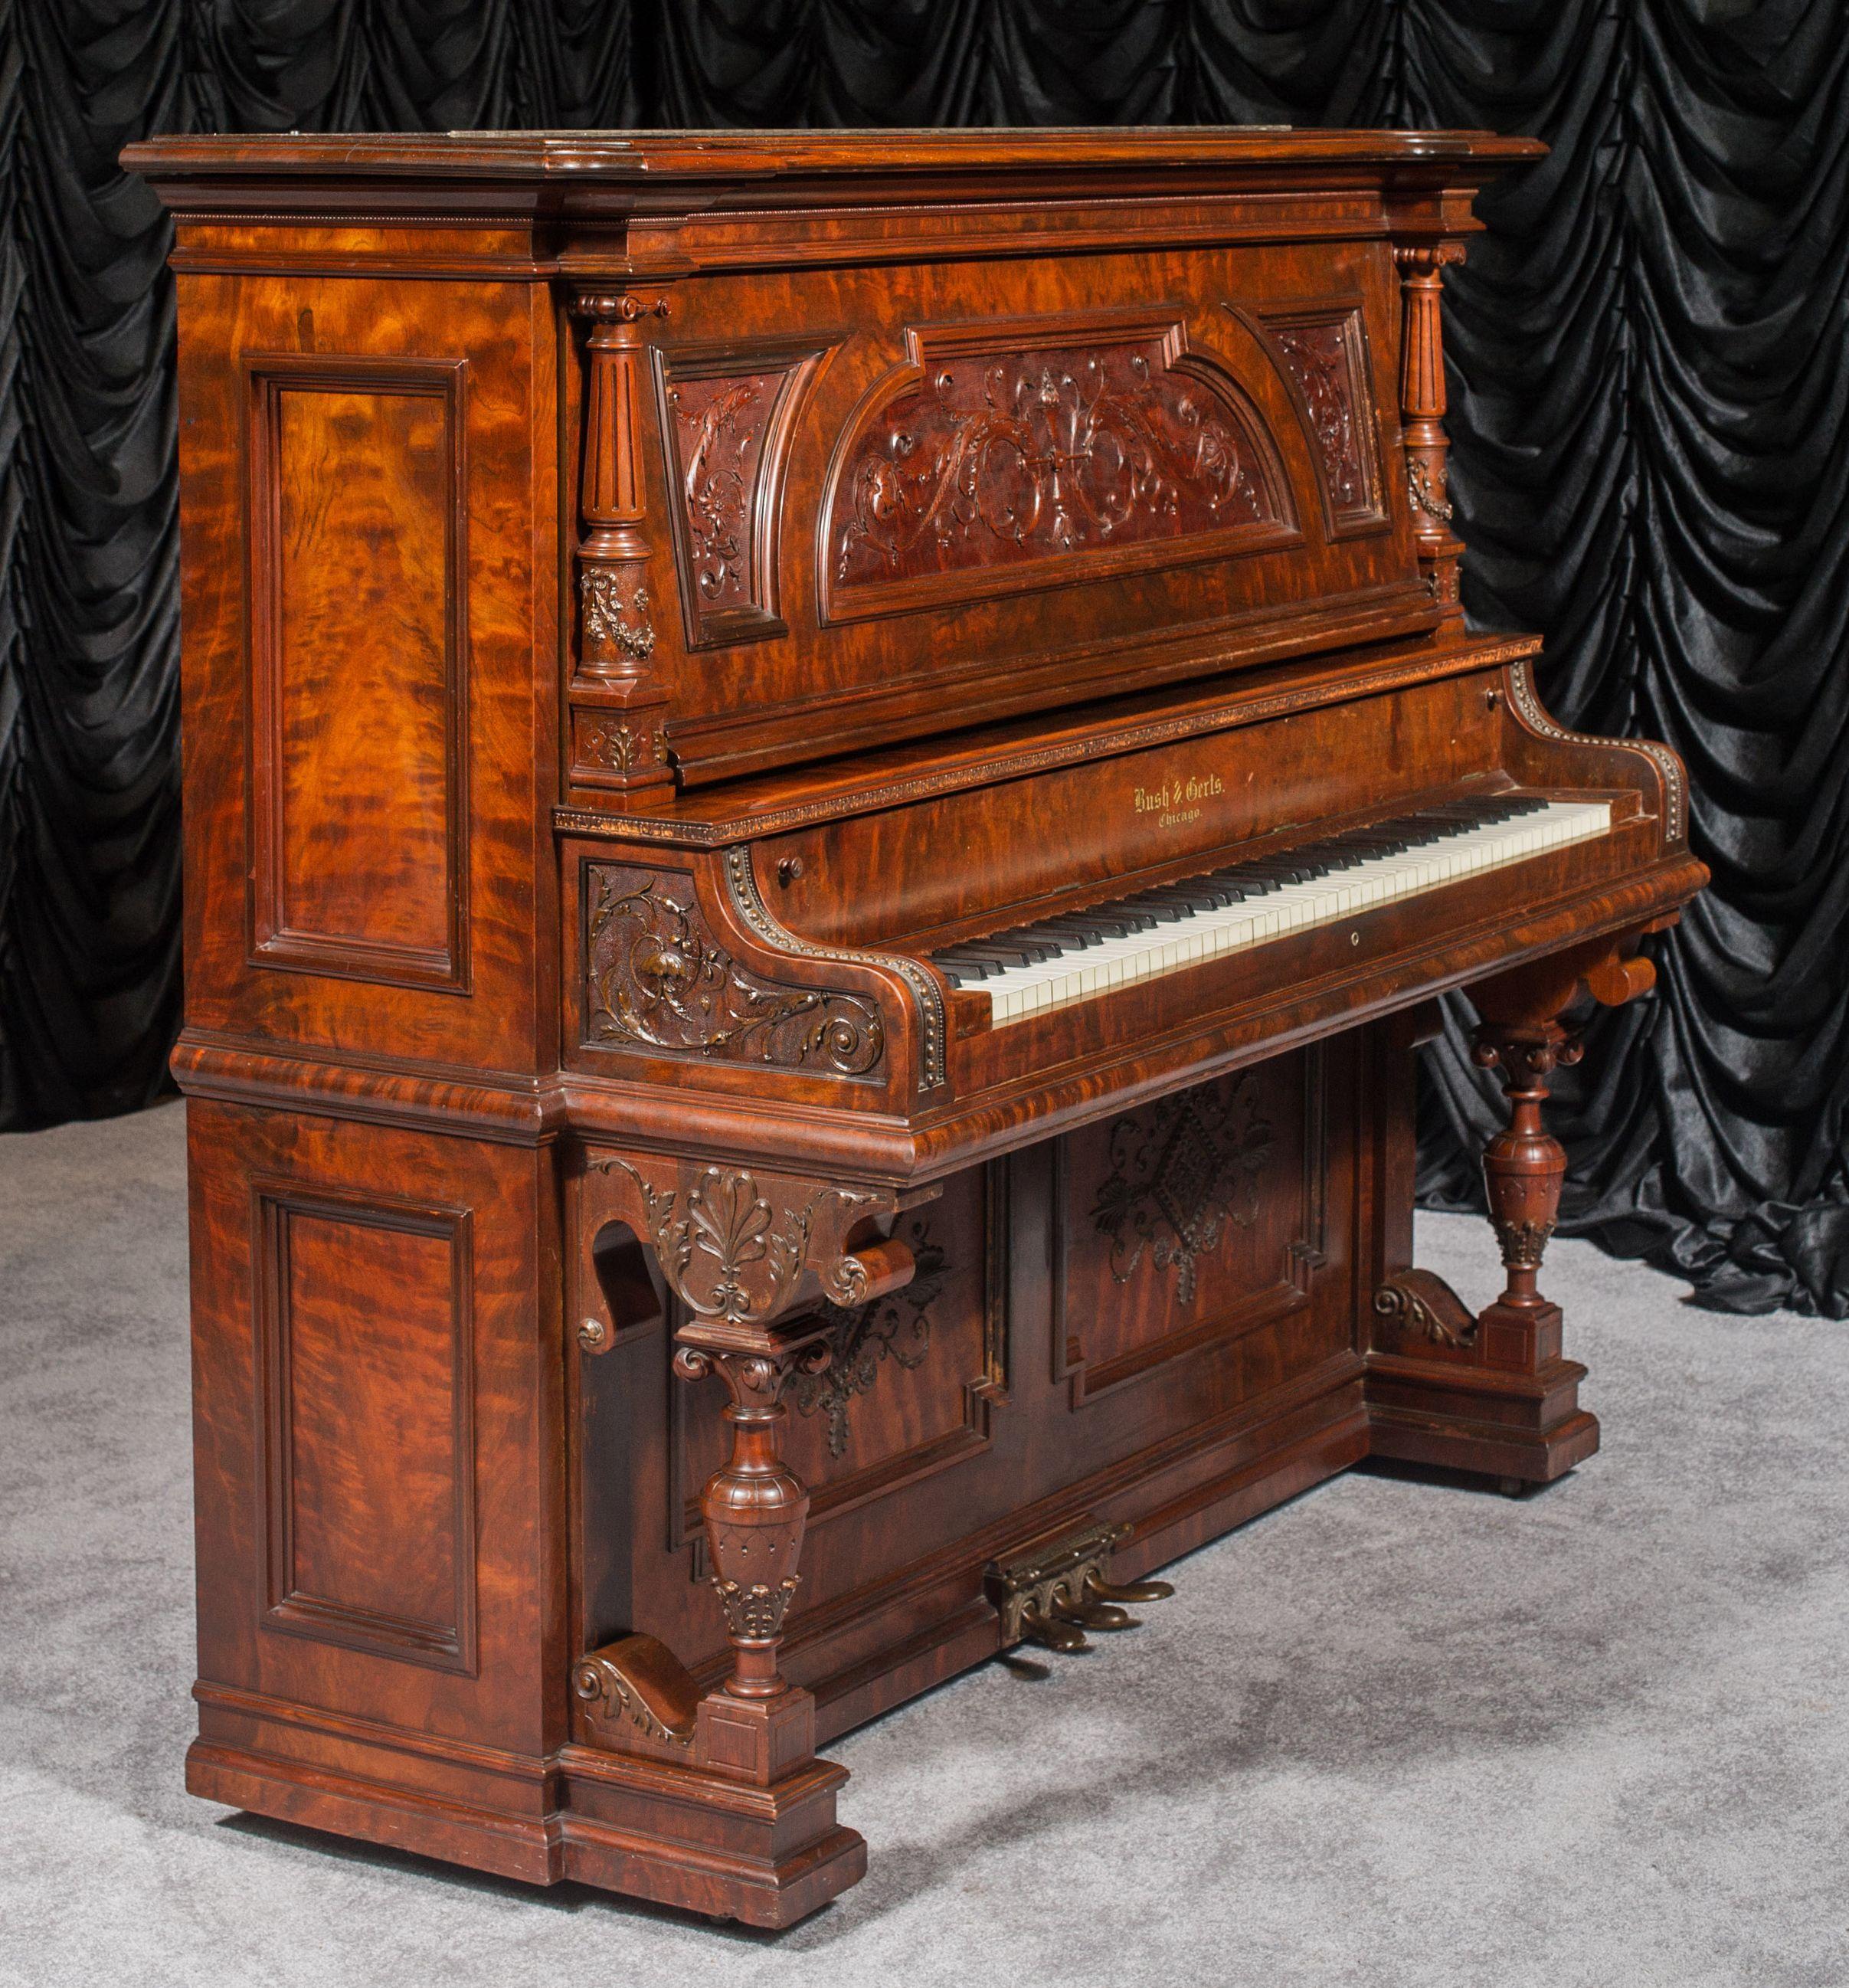 Bush Gerts Victorian Carved Upright Piano Piano Upright Piano